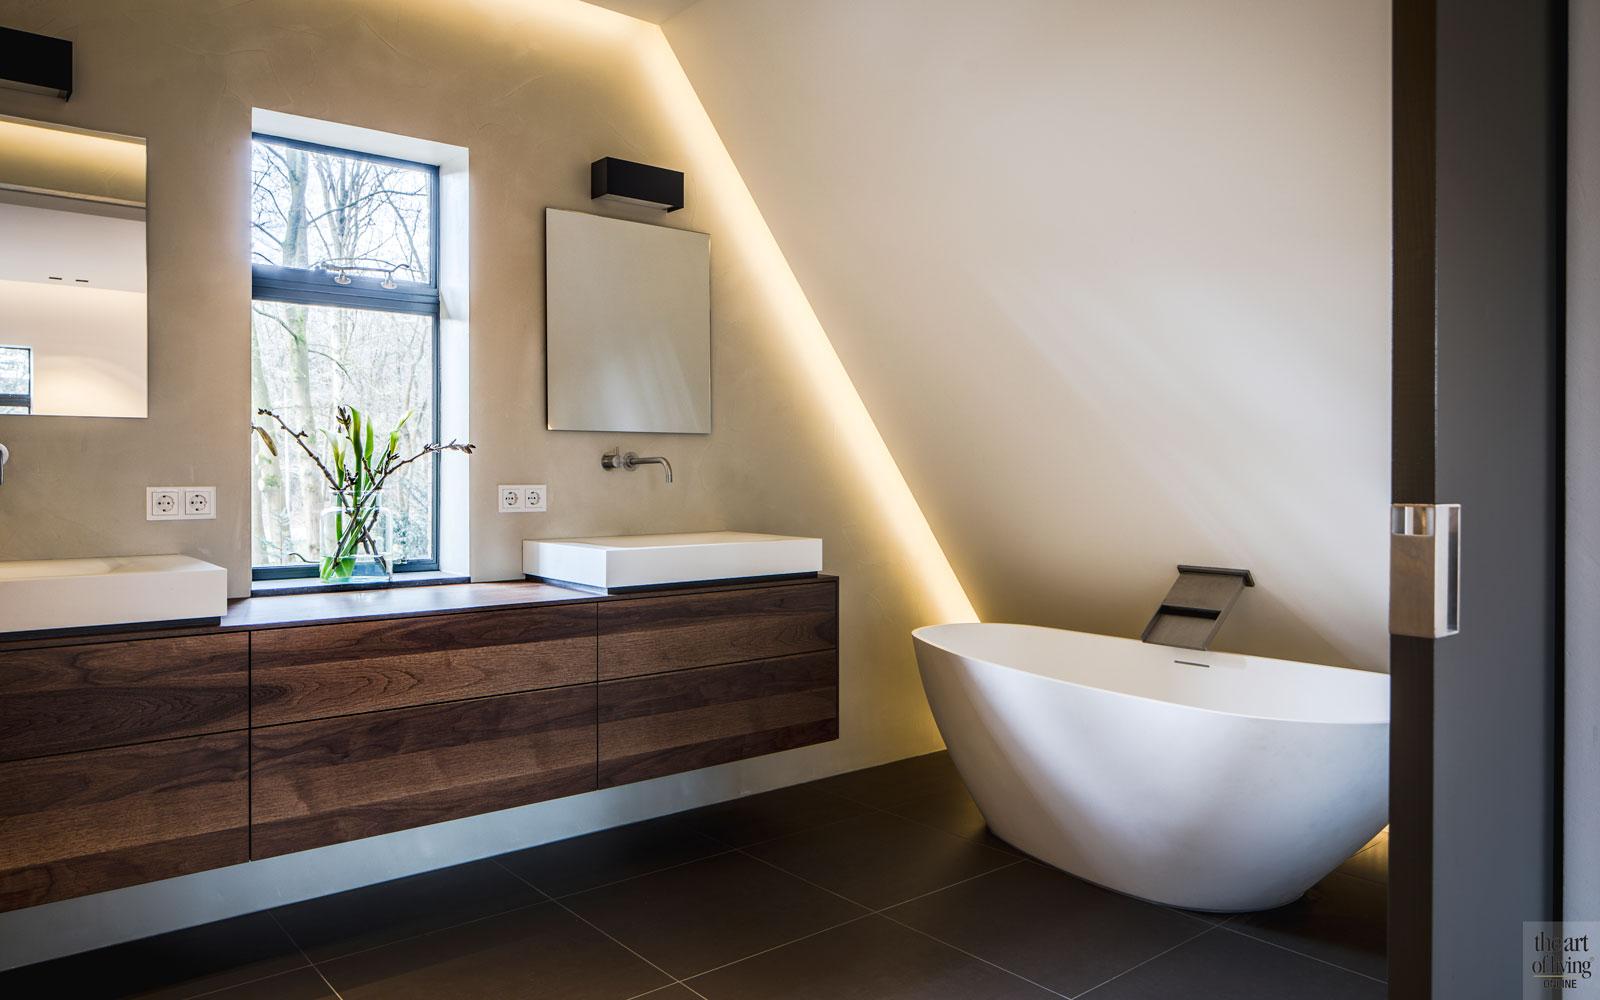 Badkamer, sanitair, vrijstaand bad, wastafel, hout, ledverlichting, monumentale villa, Van den Wildenberg.